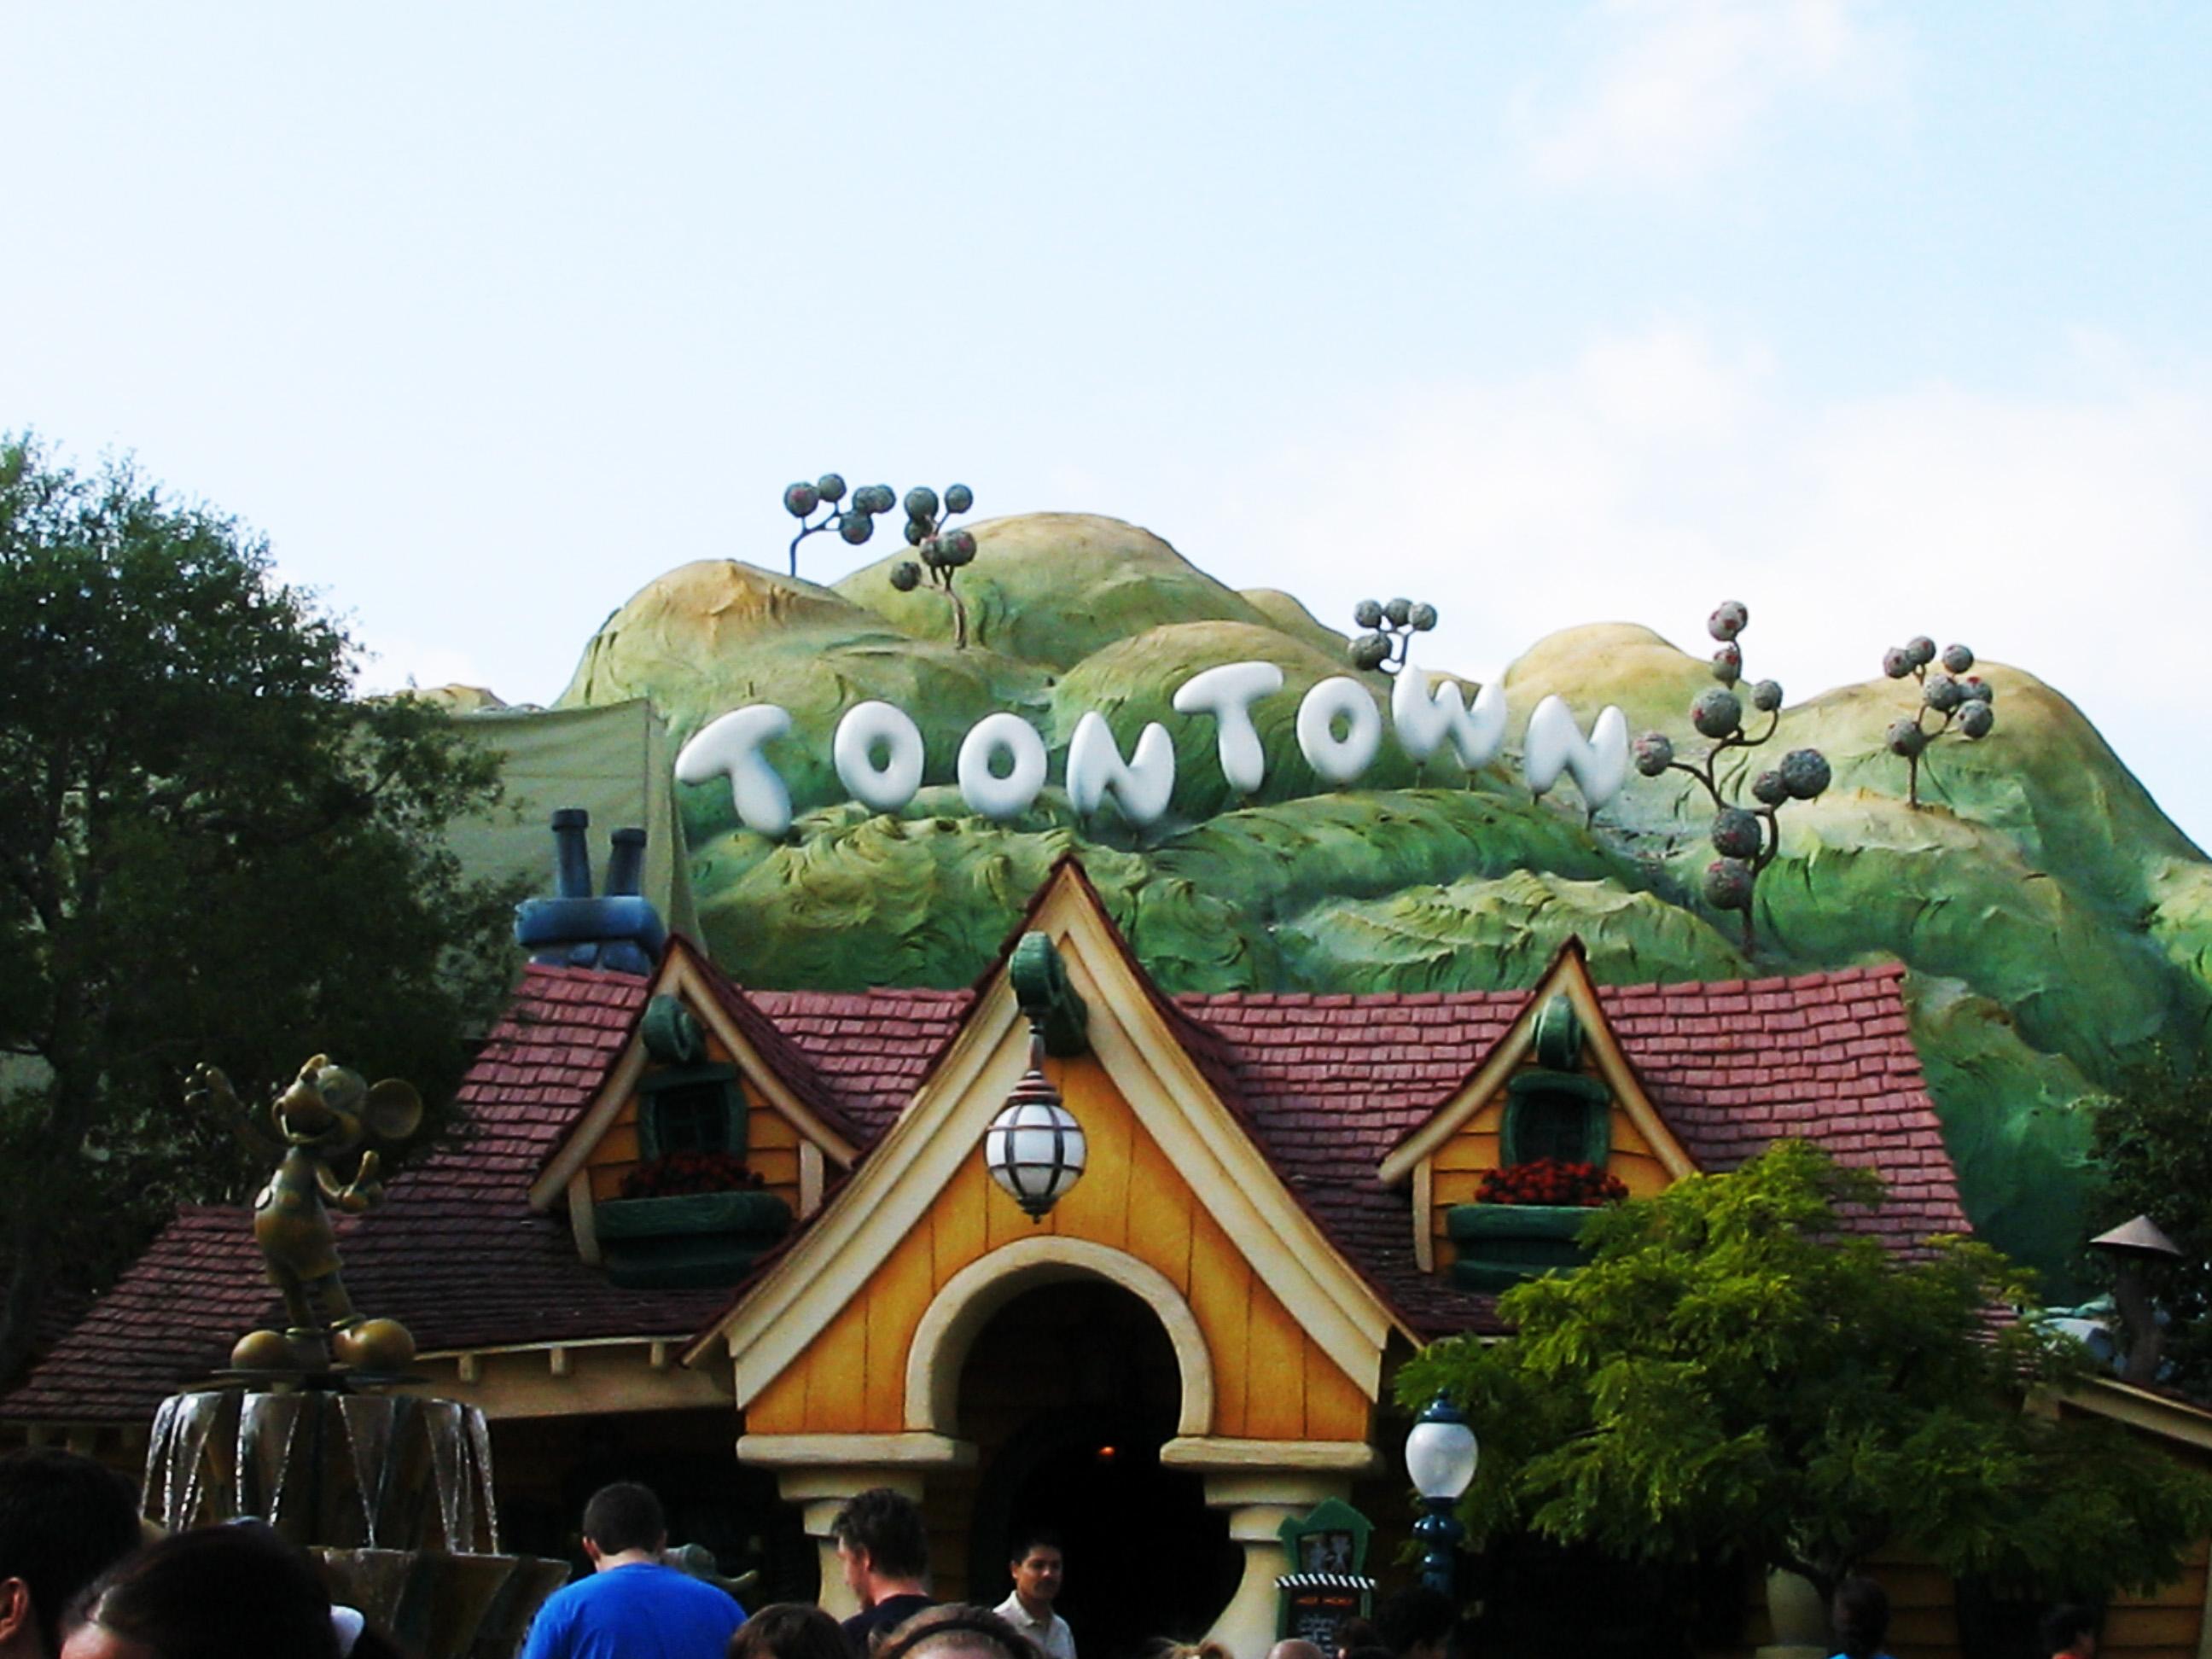 Toon Town - Disney